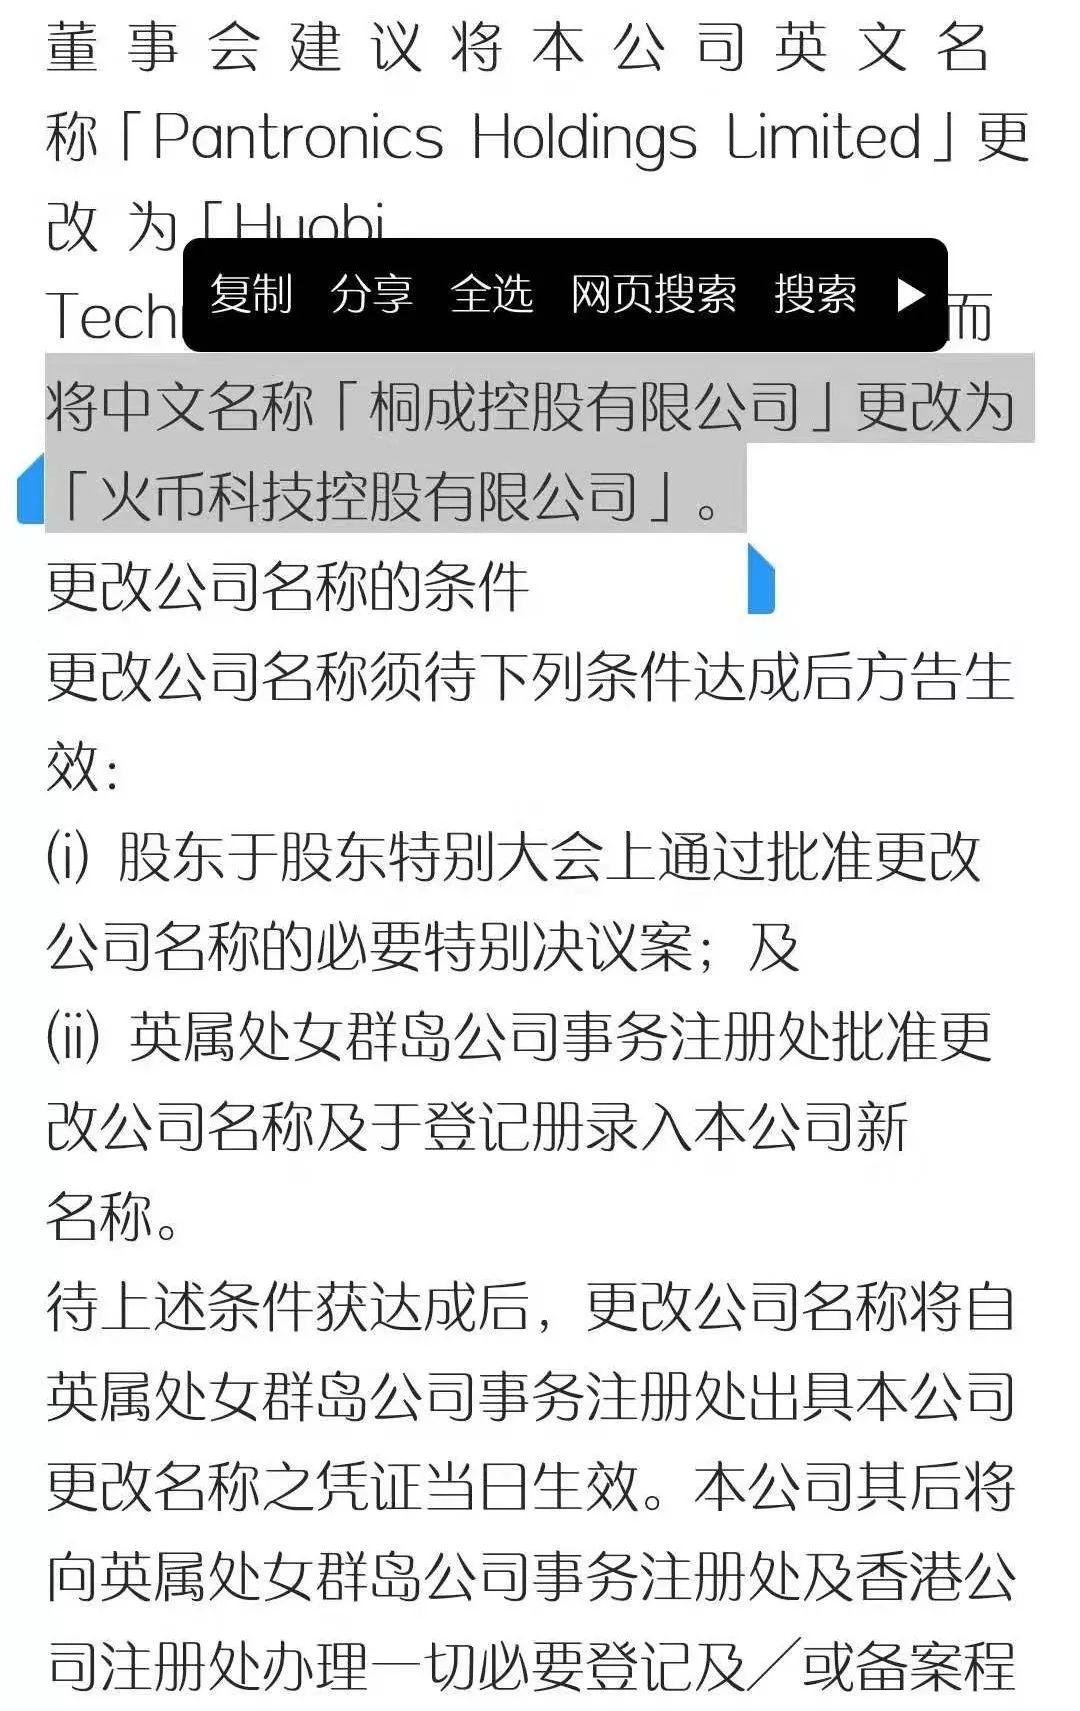 manbetx提款相当快_俄外长:俄罗斯与日本离伙伴关系还很遥远